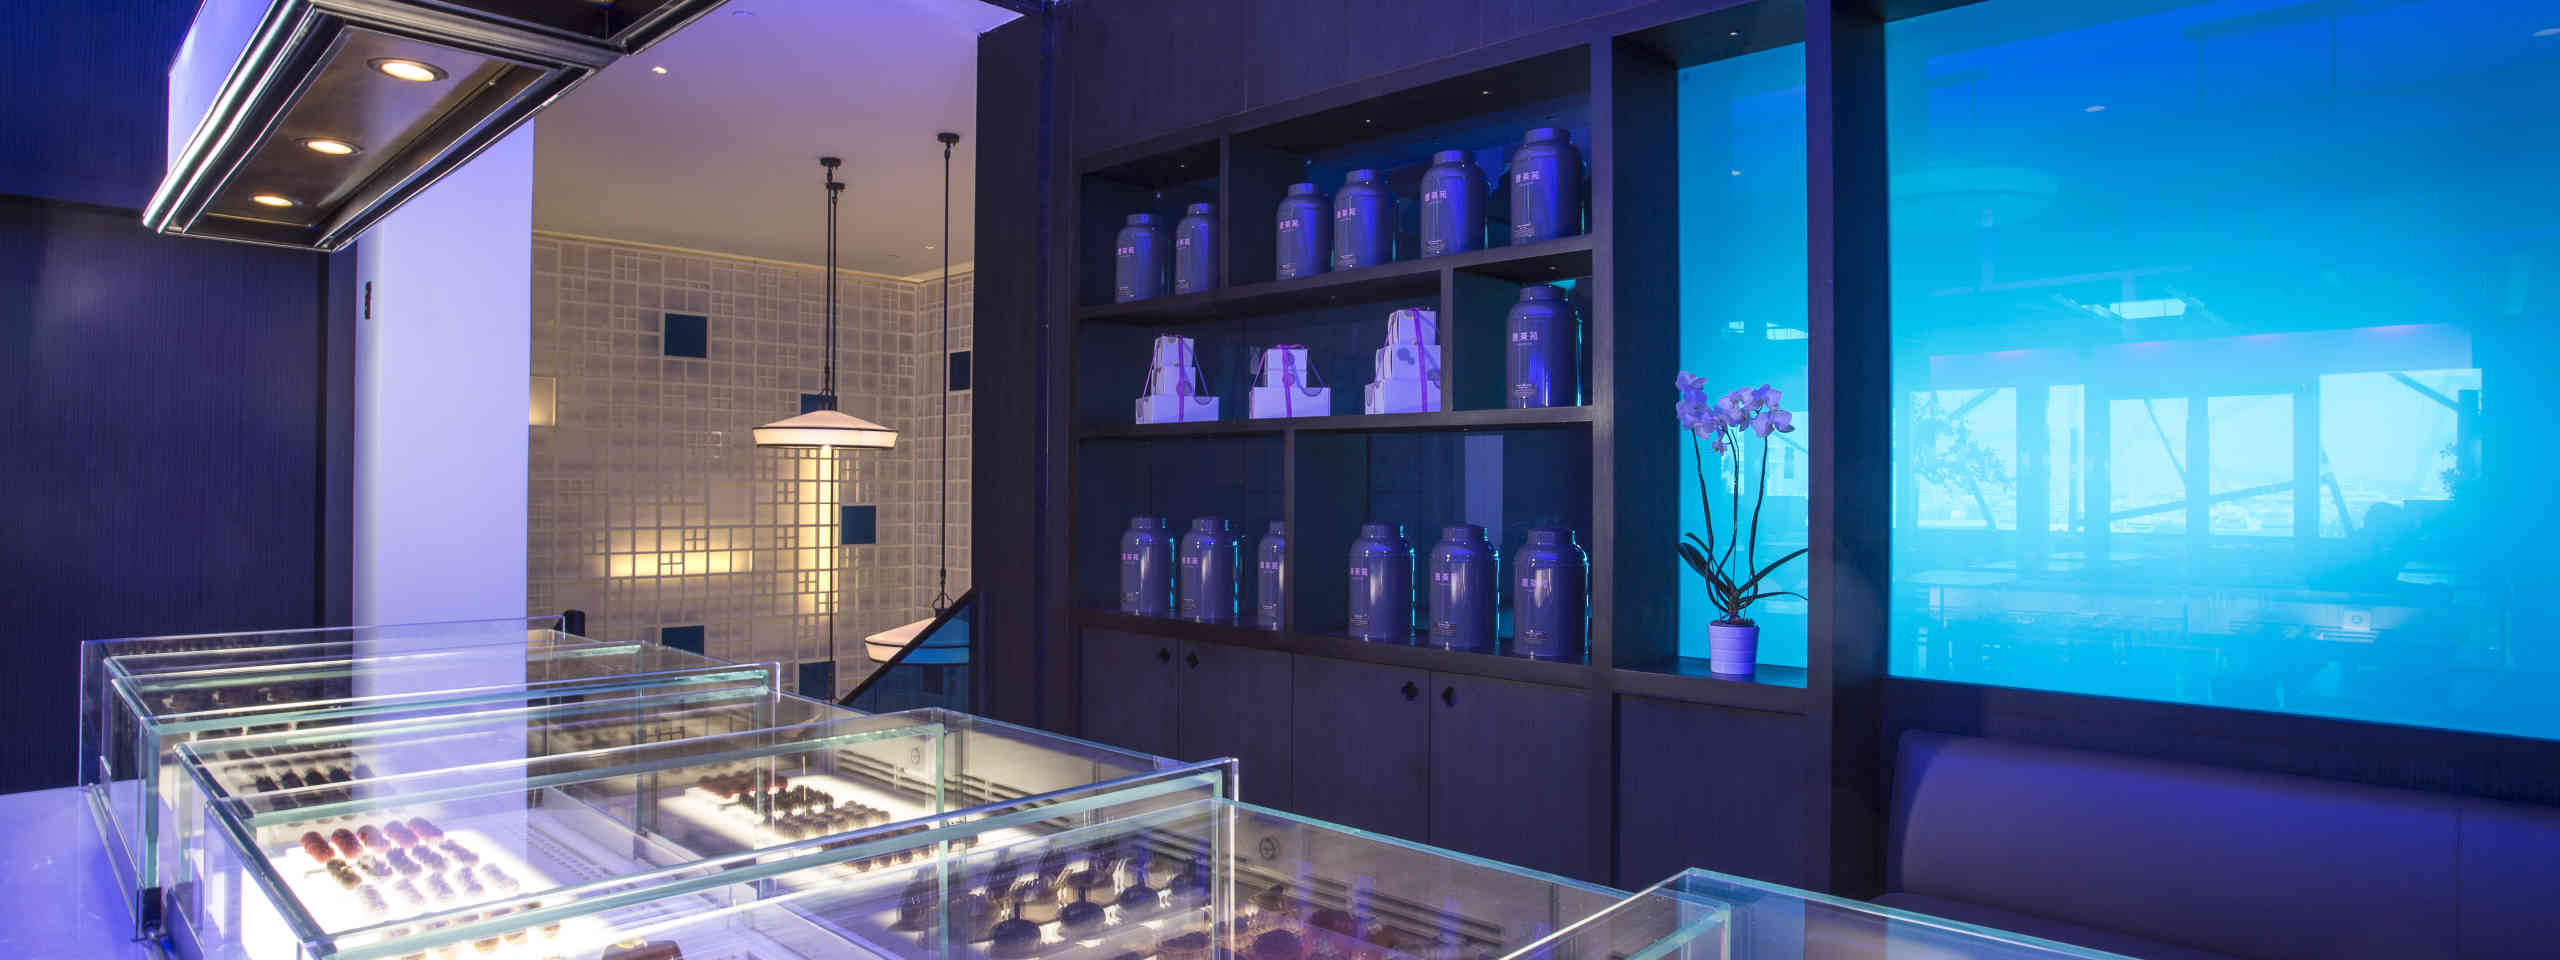 Yauatcha Riyadh Patisserie Bar